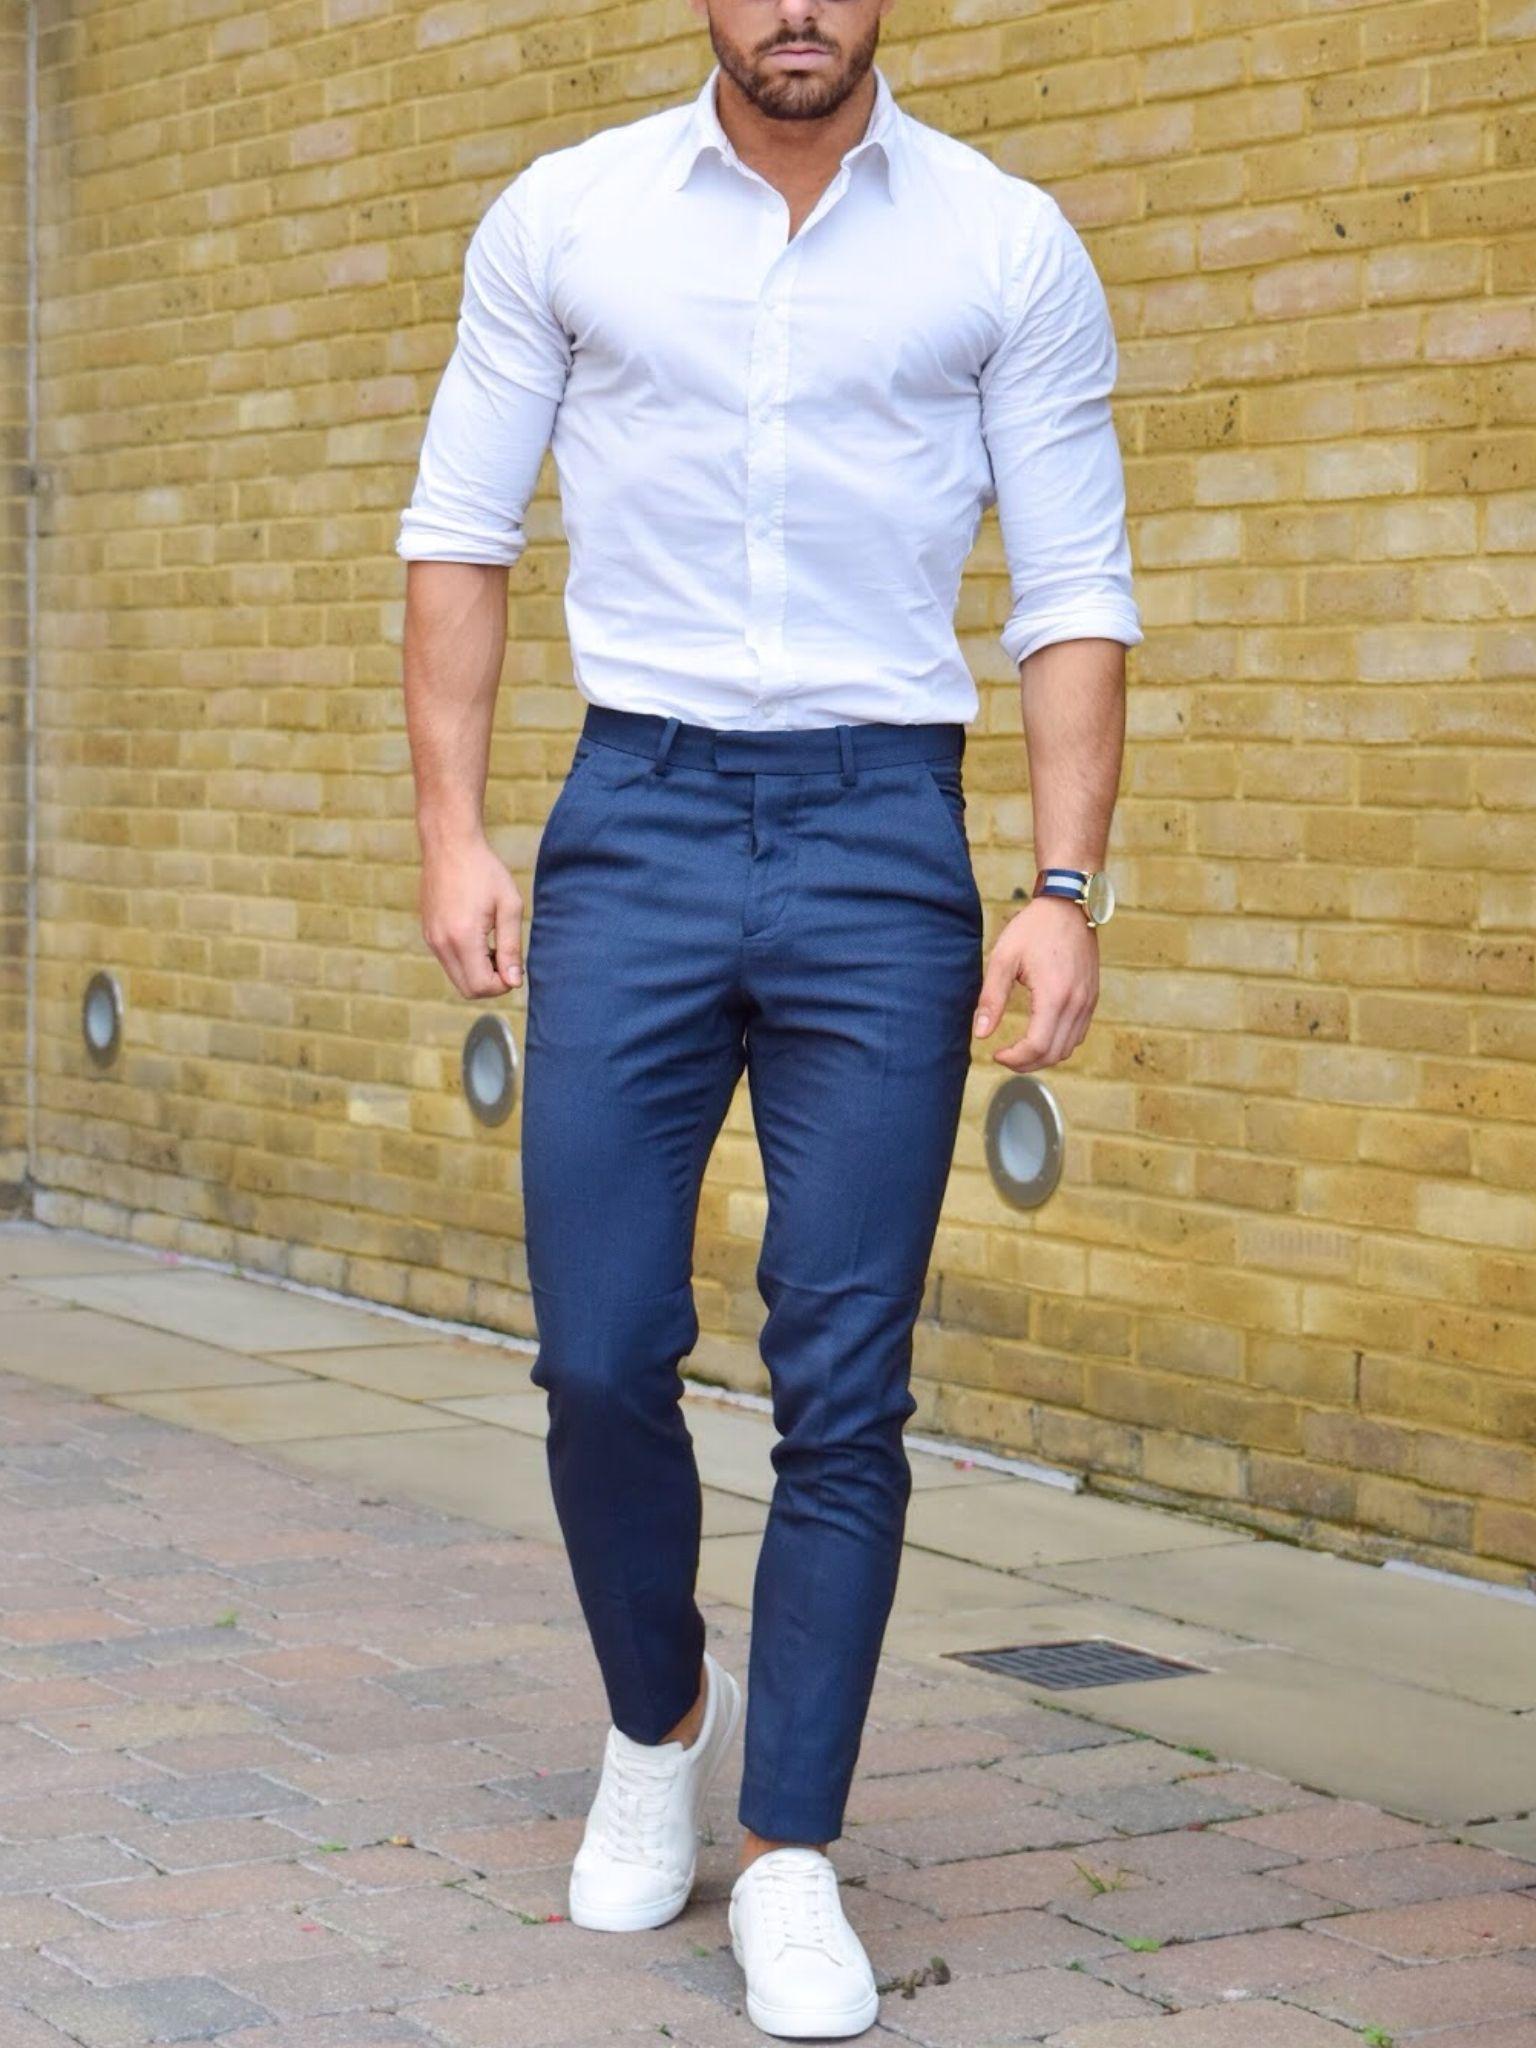 e987bde409c3 Men's fashion # fashion for men # mode homme # men's wear   relax ...